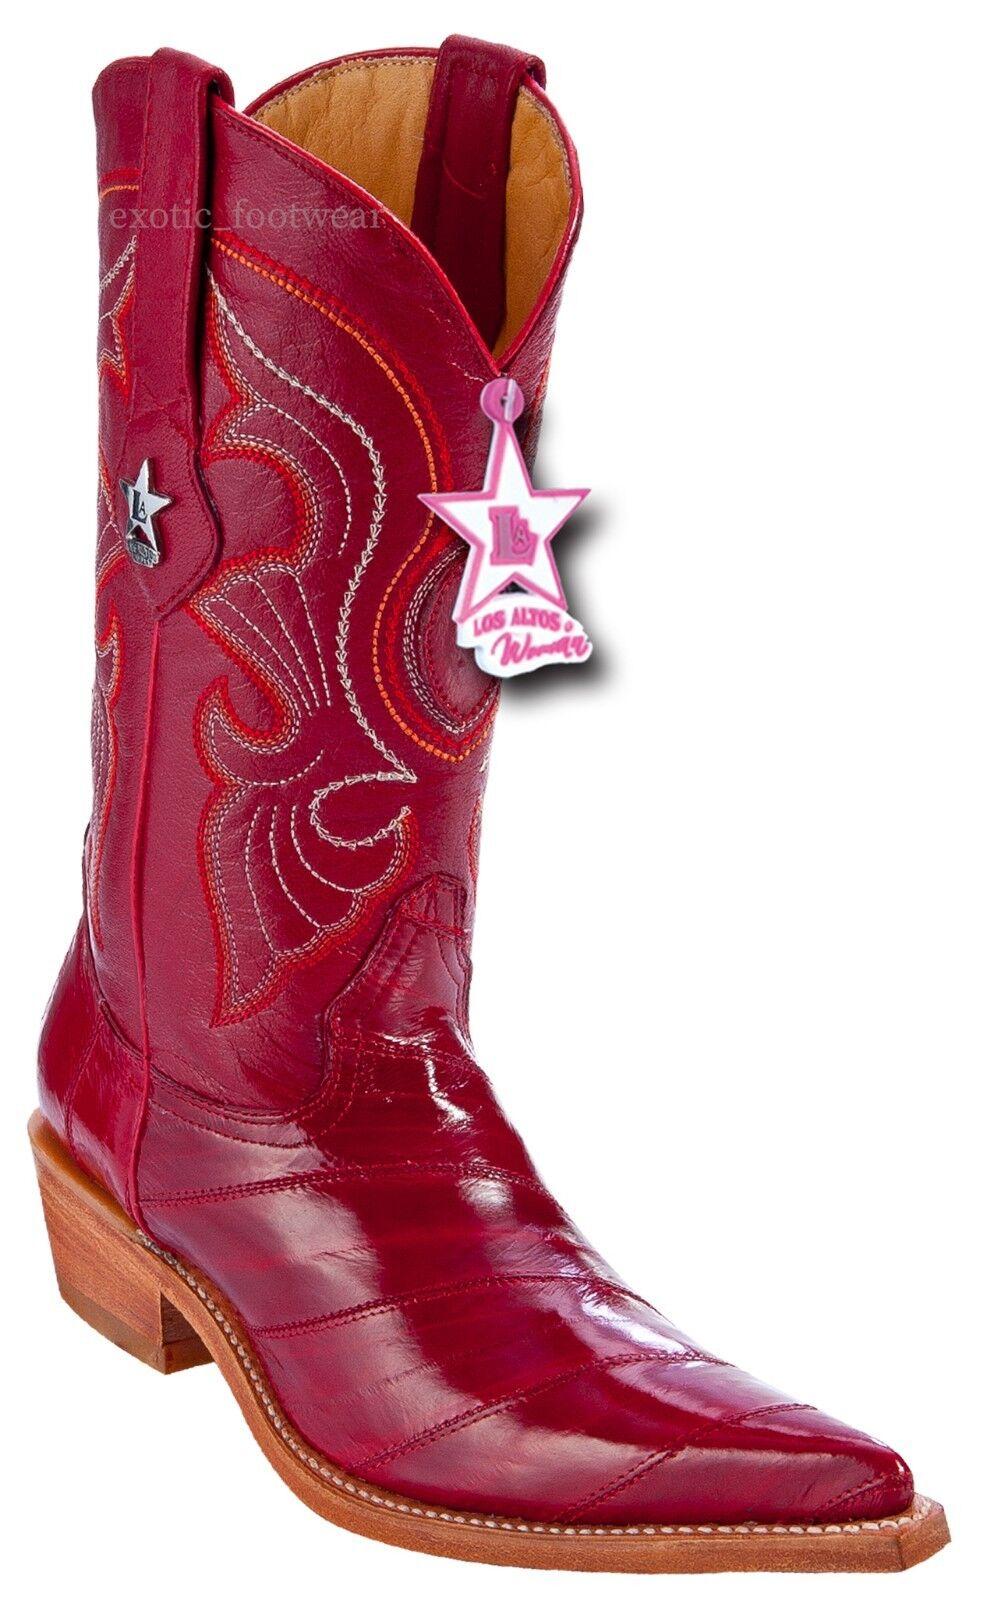 Women's Los Altos Genuine Eel Skin Western Boots 3X Pointy Toe Handmade Medium